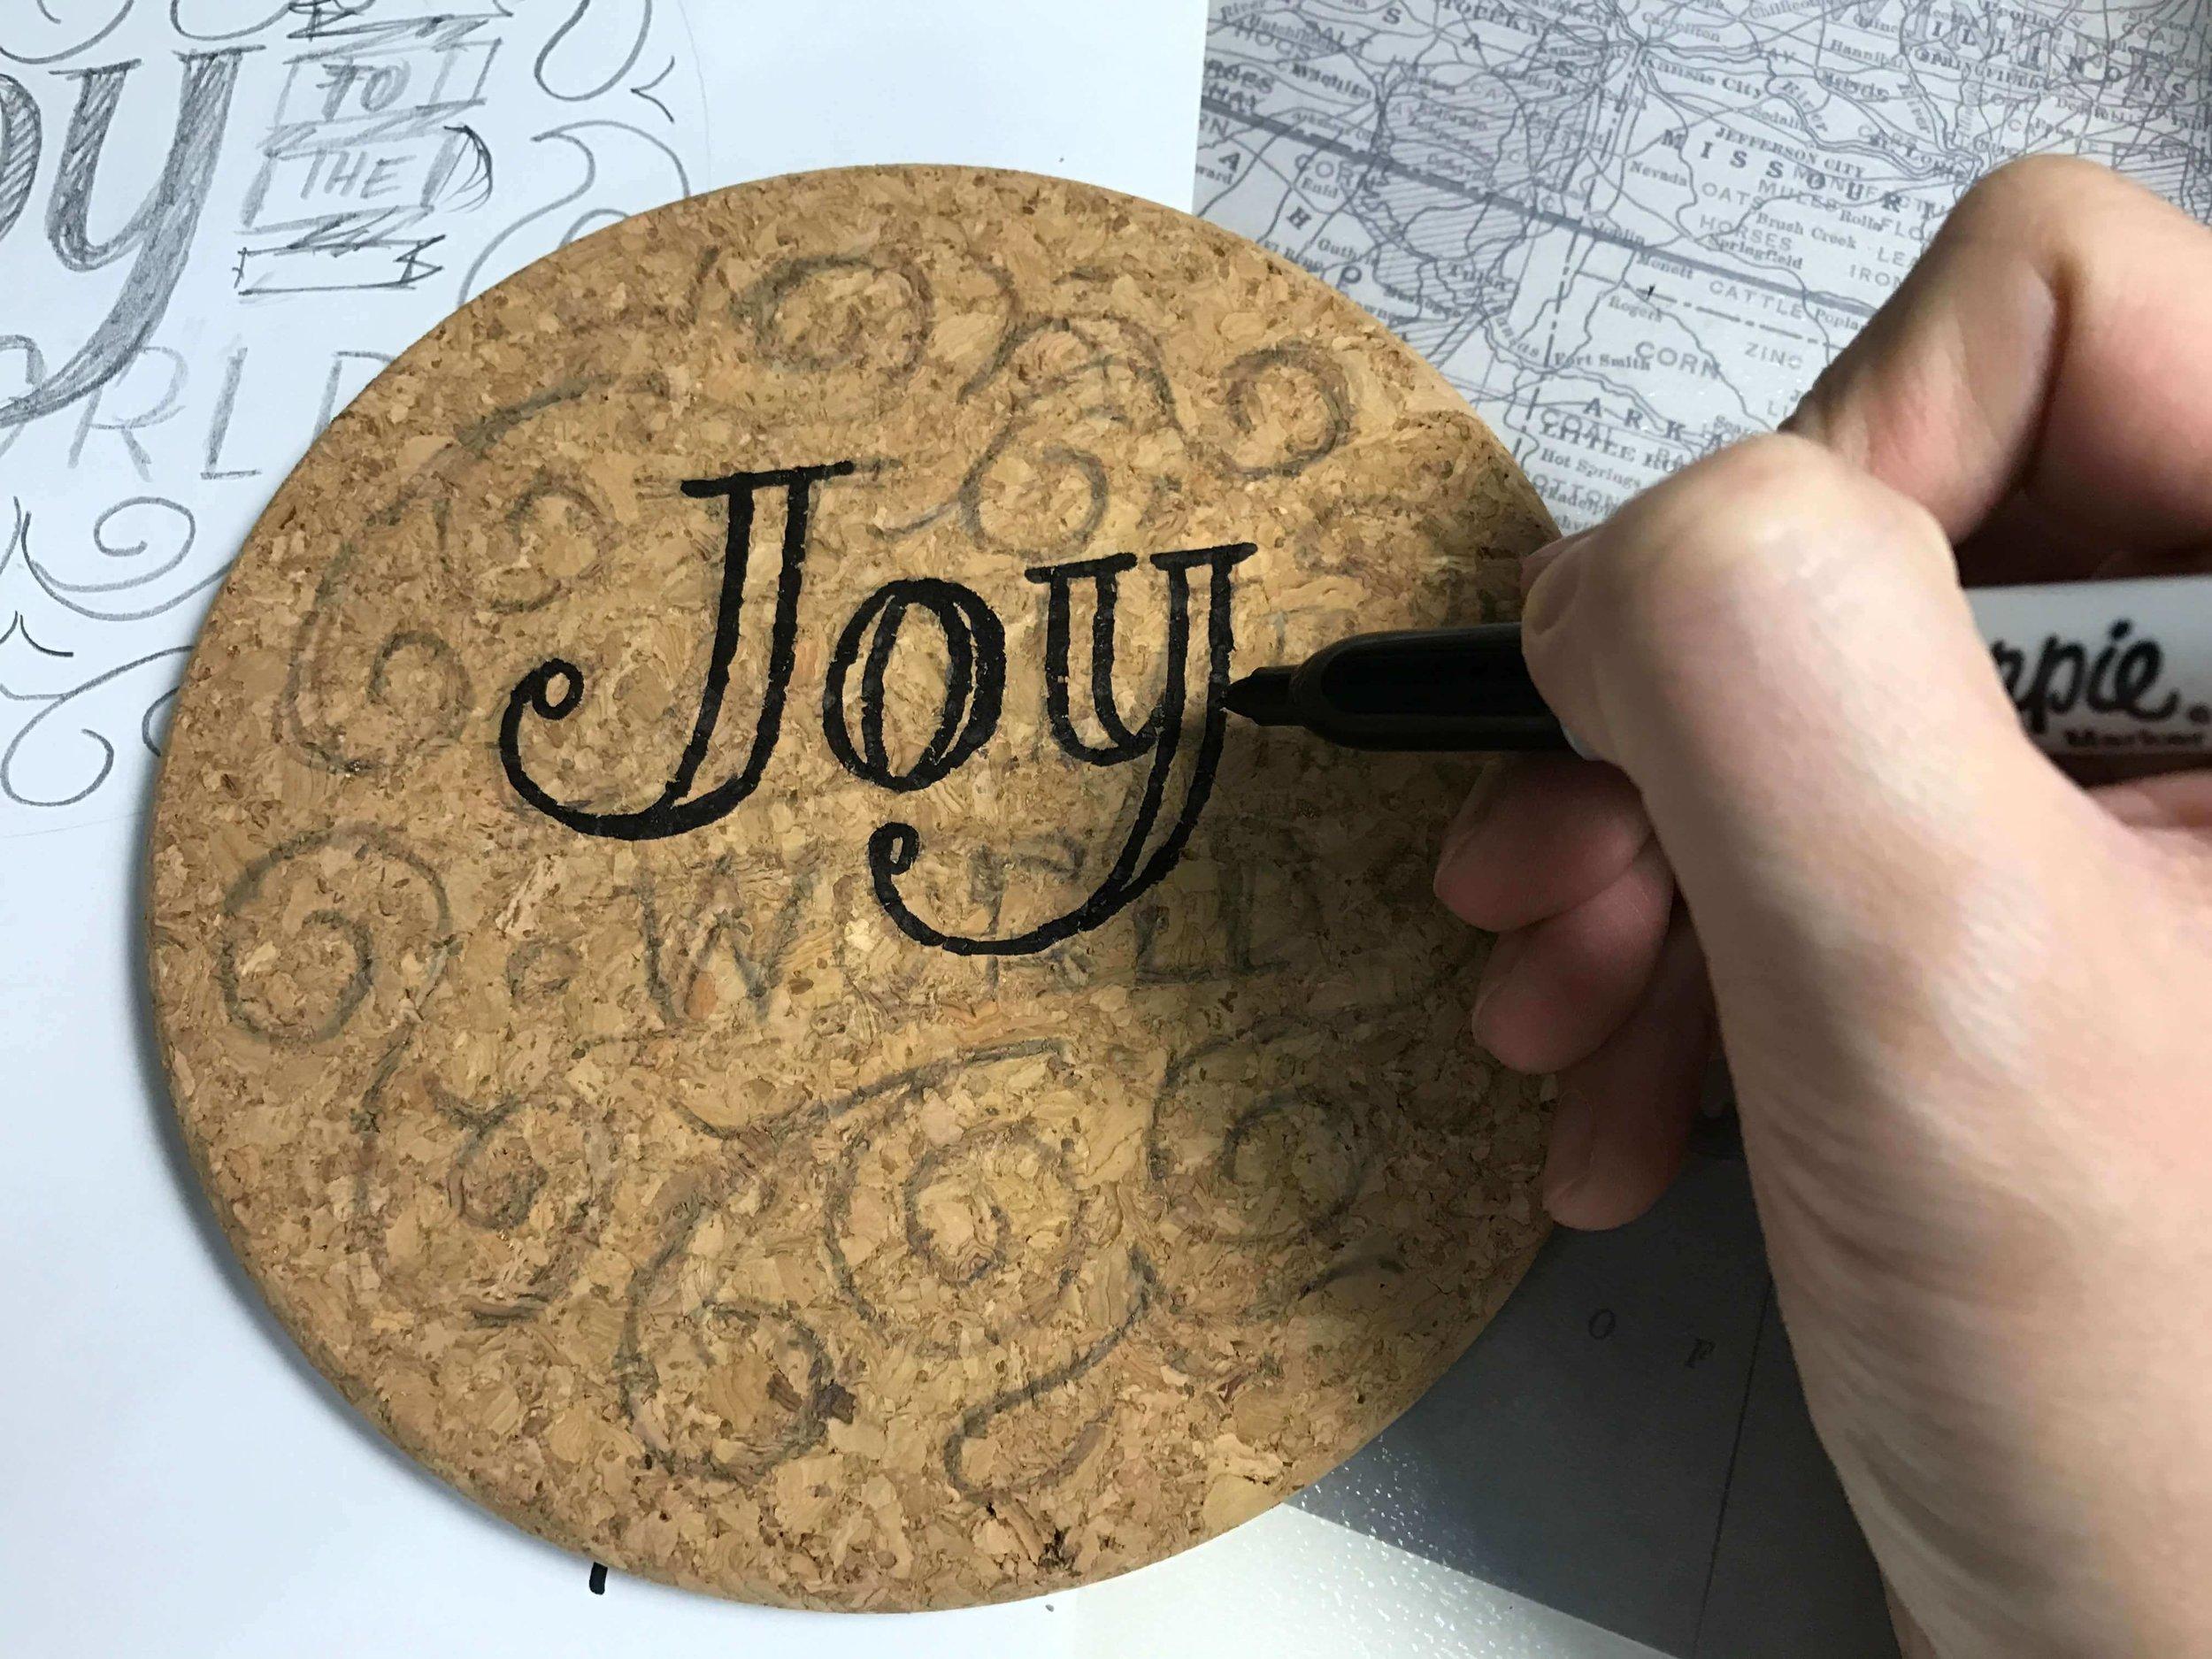 joy-to-the-world-process